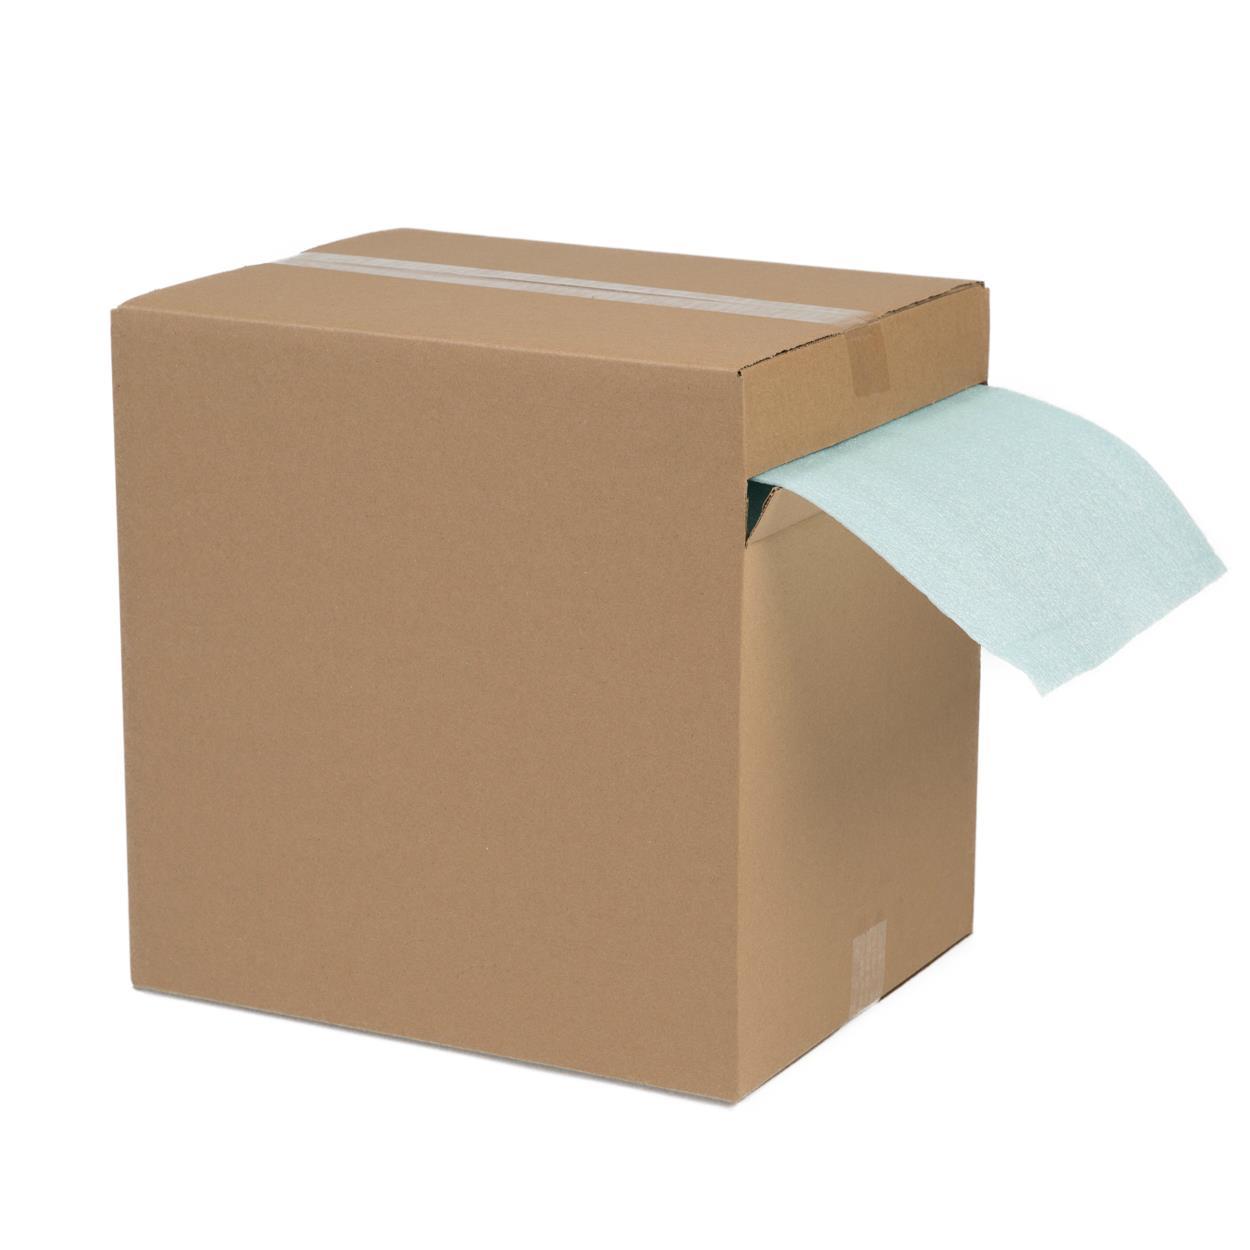 Cushion-Foam-Dispensing-Box